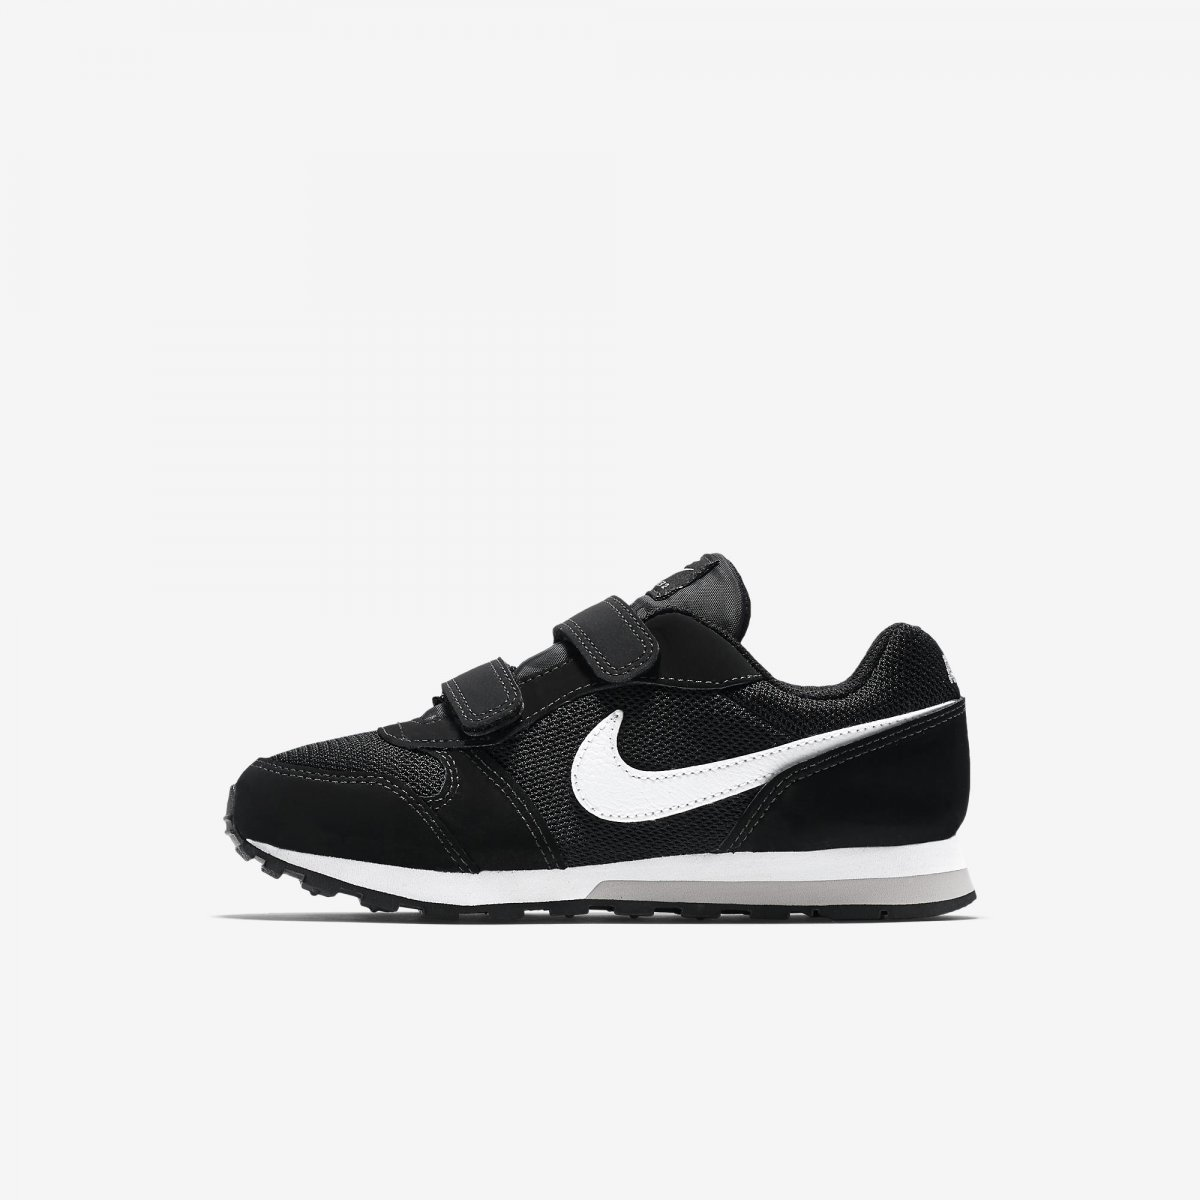 Bizz Store - Tênis Infantil Menino Nike MD Runner 2 Corrida 747c4bcdc1da6